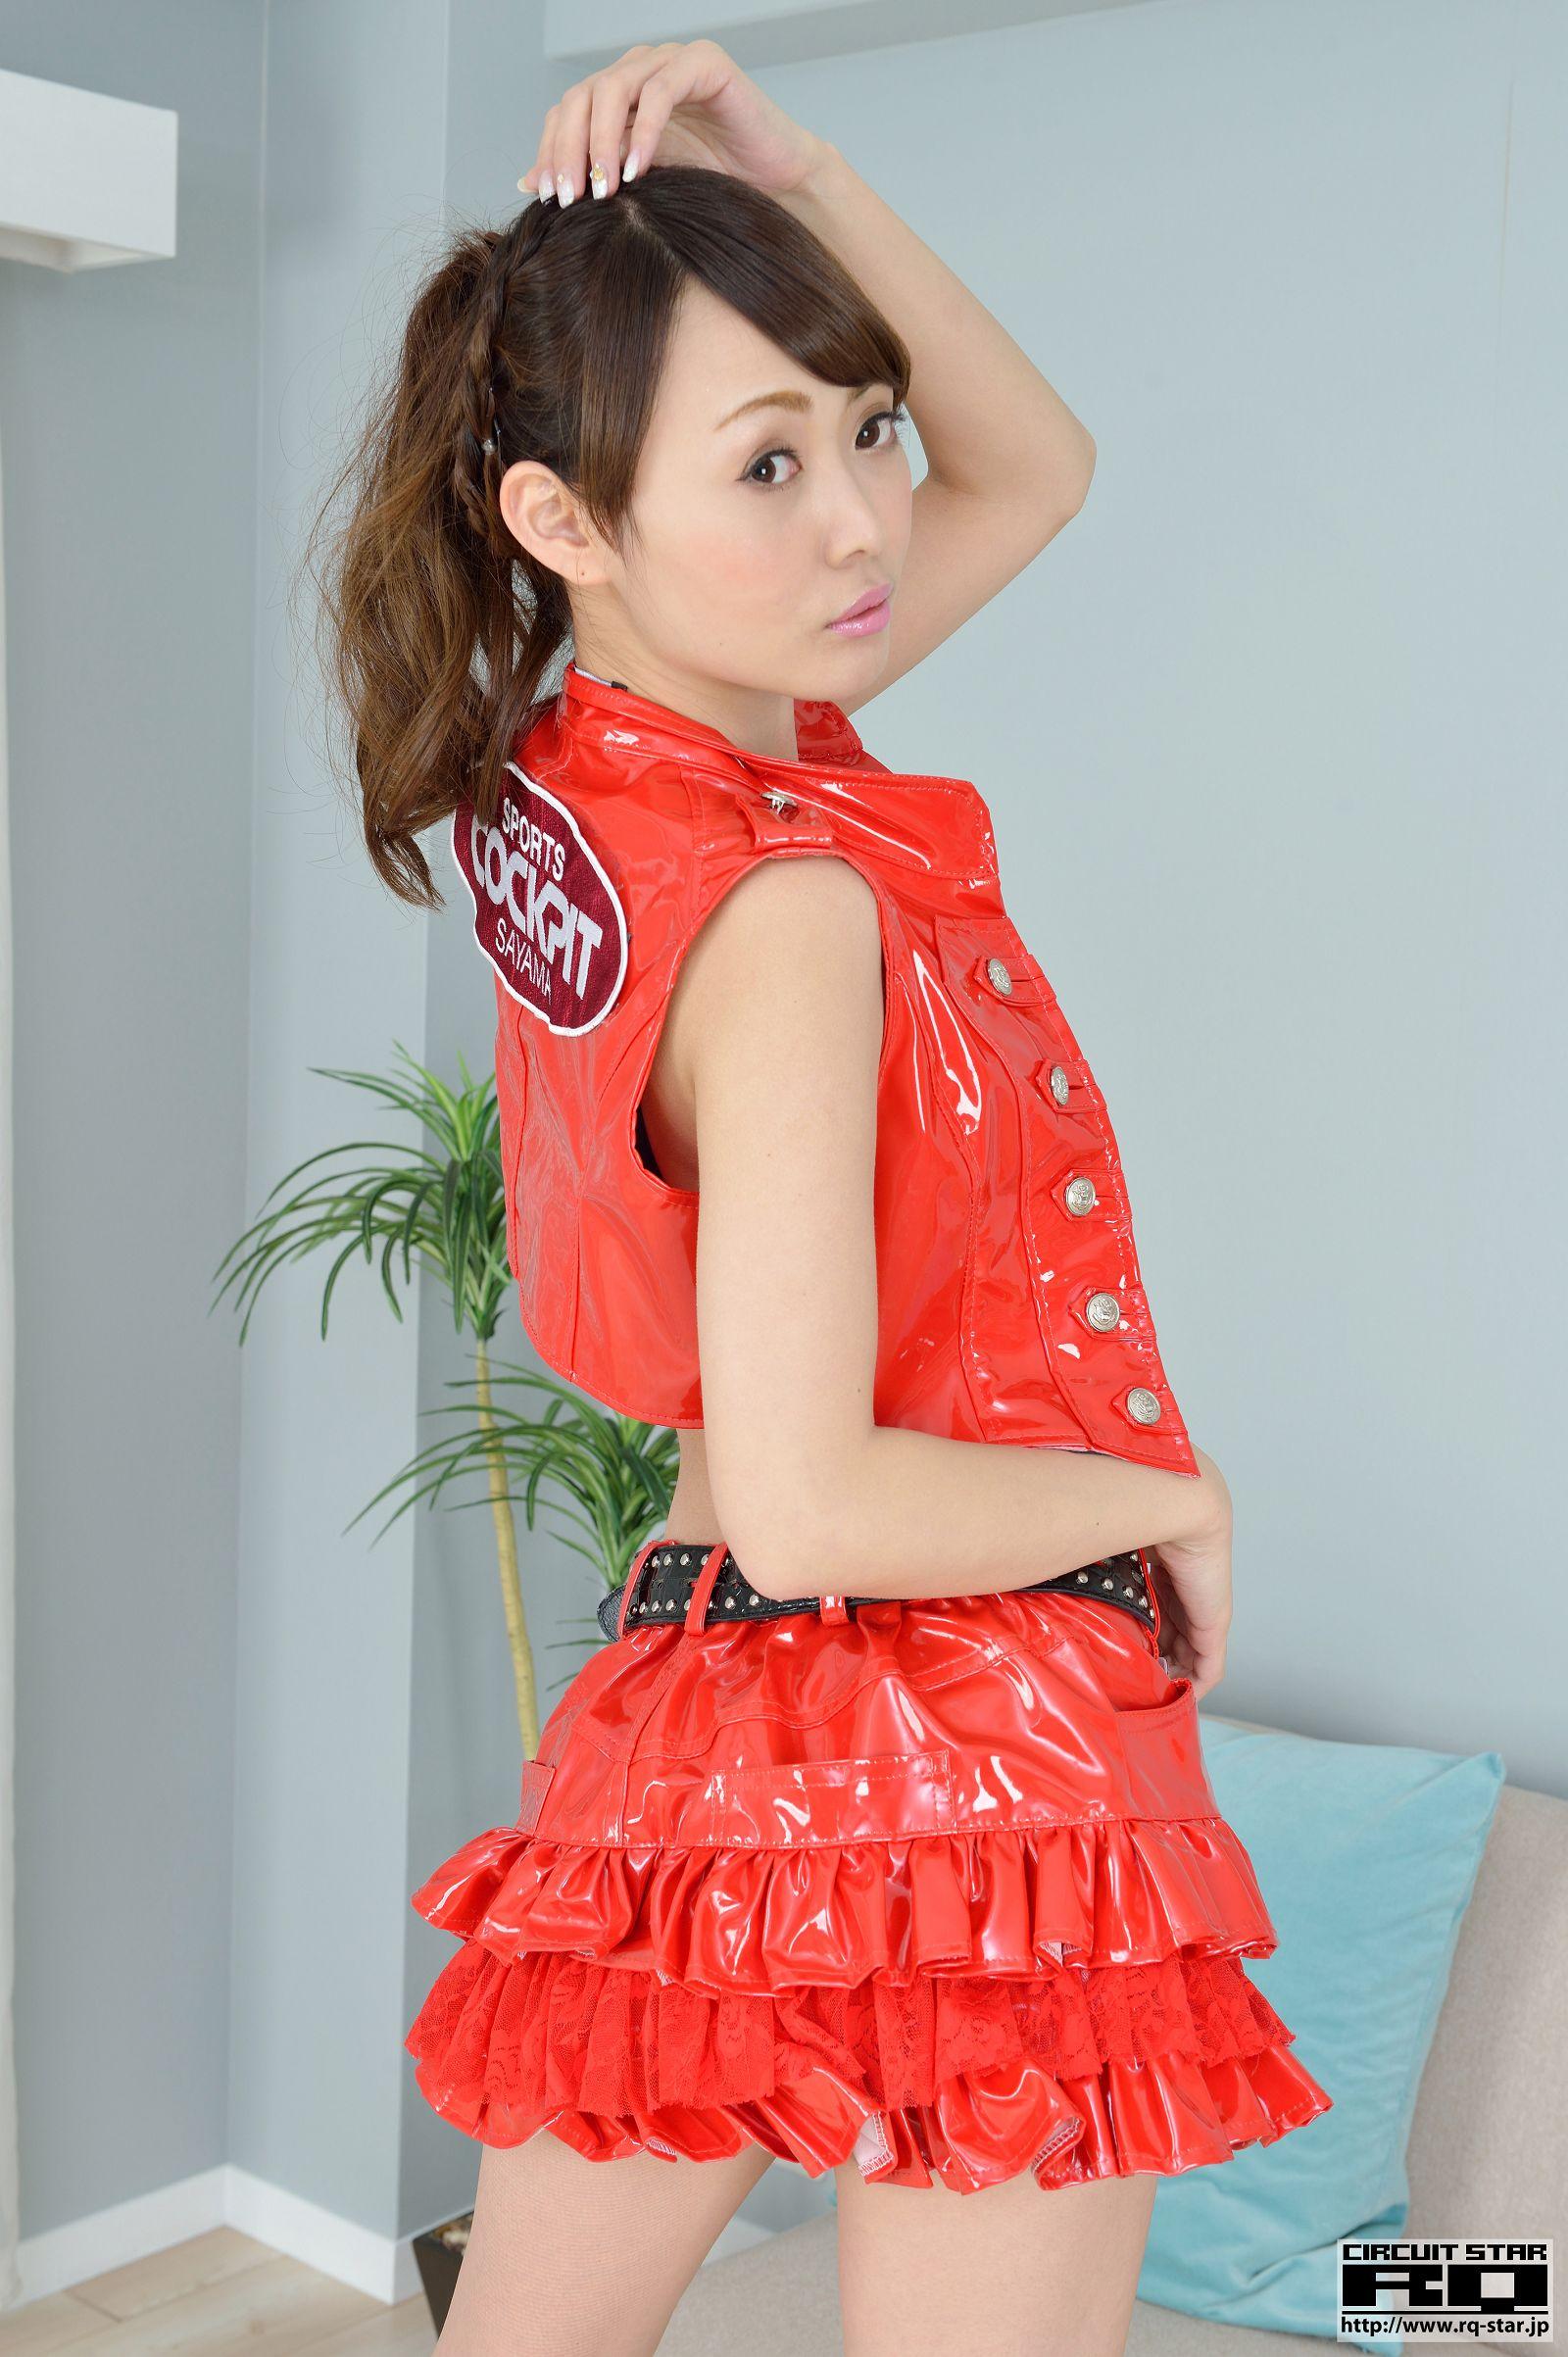 [RQ STAR美女] NO.00925 Asami Aihara 相原麻美 Race Queen[111P] RQ STAR 第2张